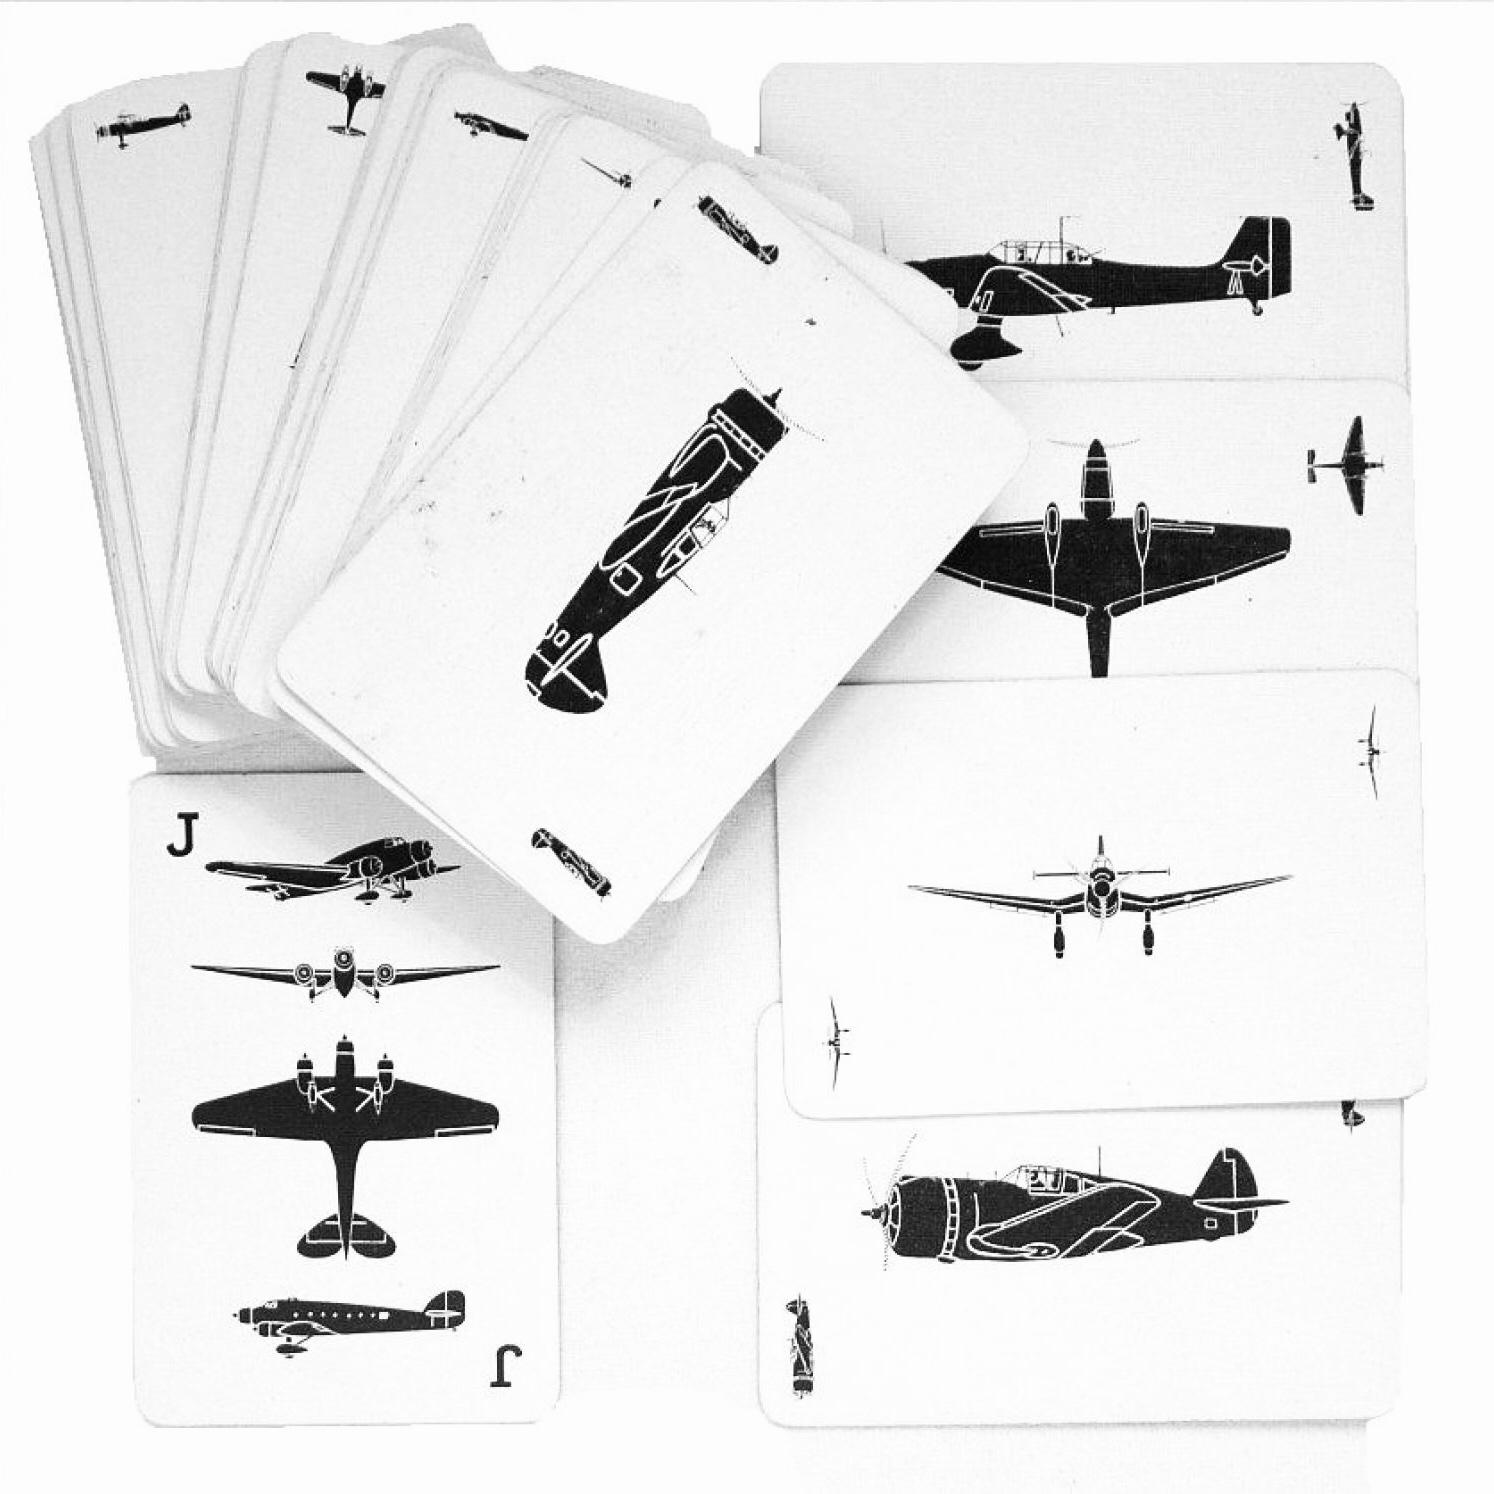 Inspiration: Aircraft Identification Cards